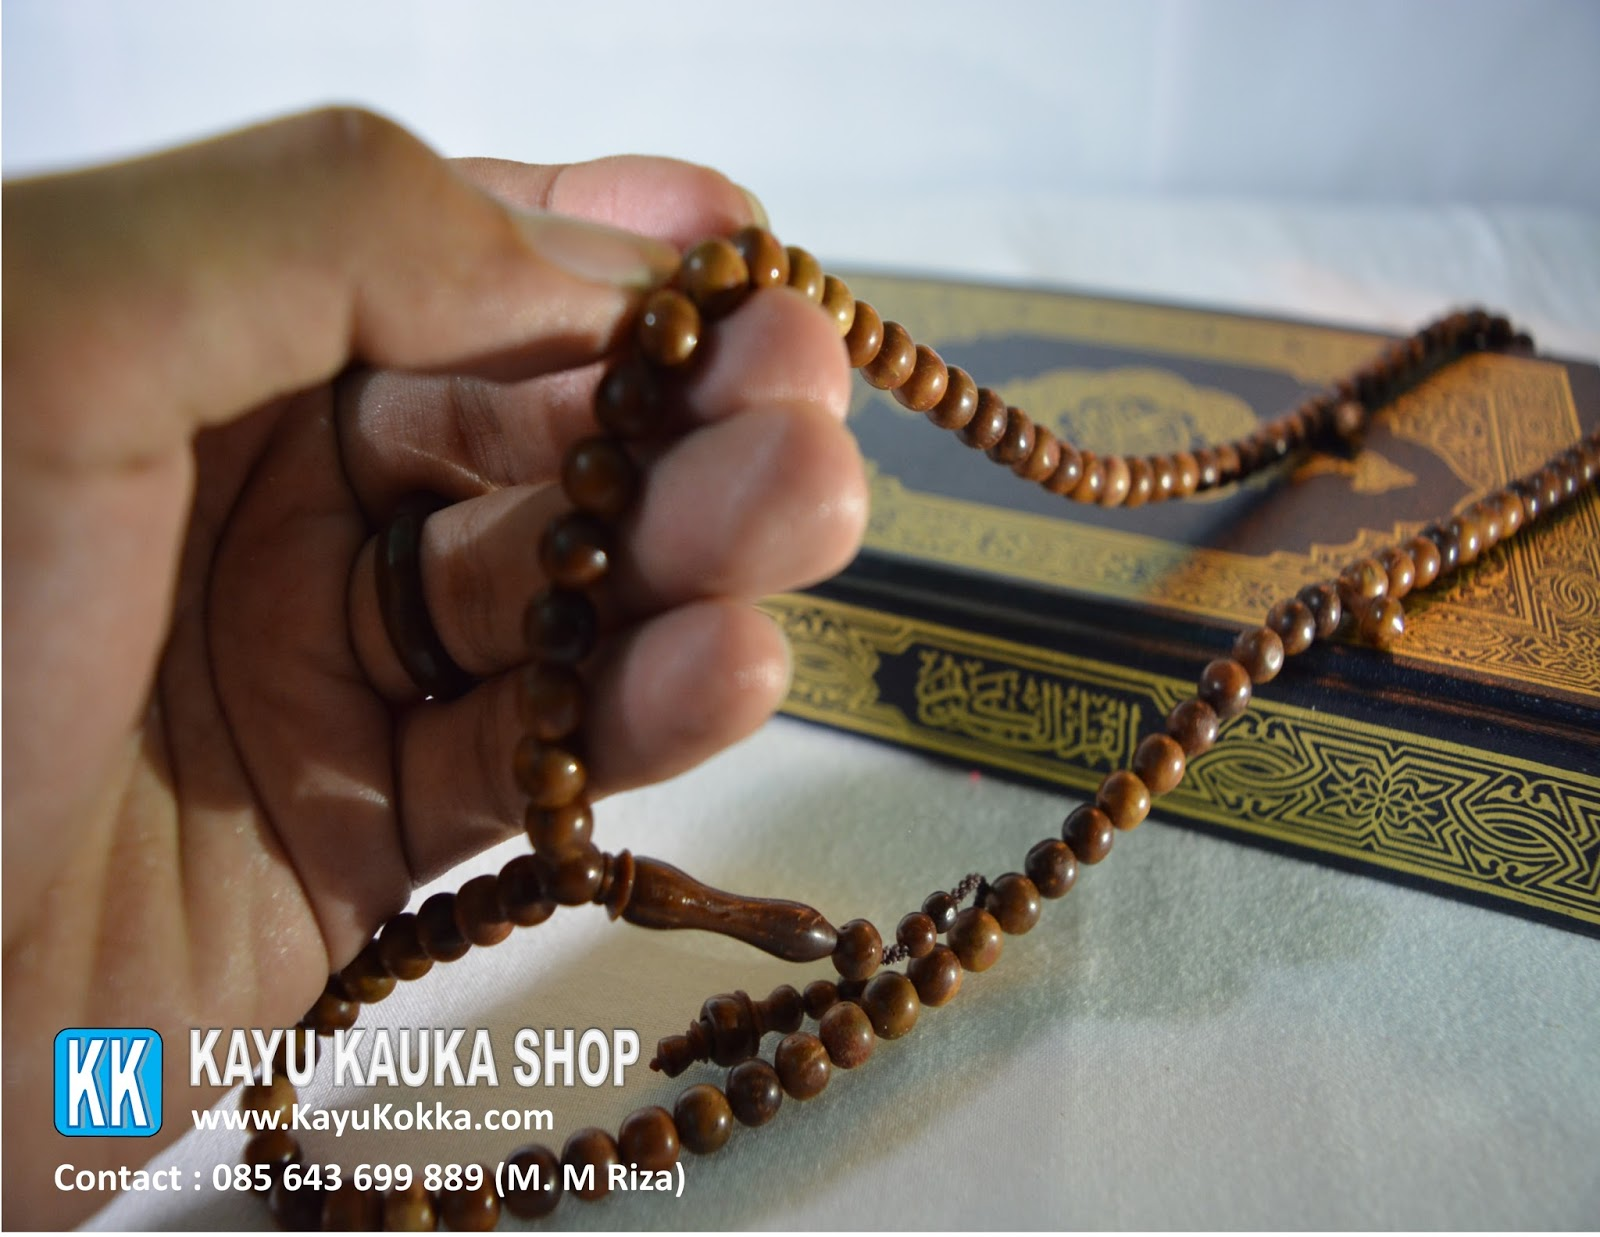 Tasbih Kayu Kokka Asli Turki 99 Rp 450000 Gelang Original Koka Kaukah Kauka Kaoka Warna Hitam Tasbih2bkokka2basli